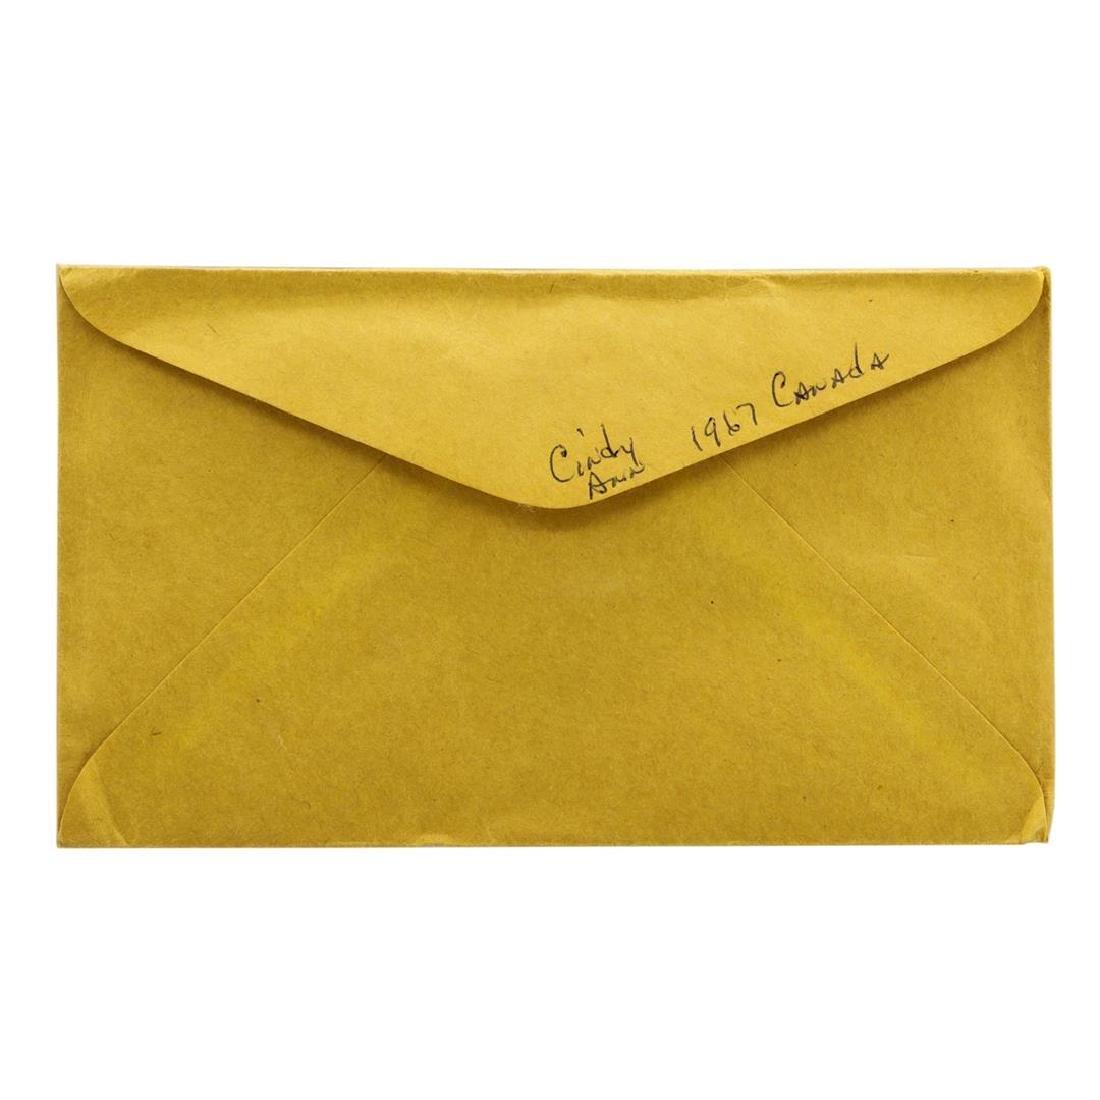 1967 Canada (6) Proof Set w/ Envelope